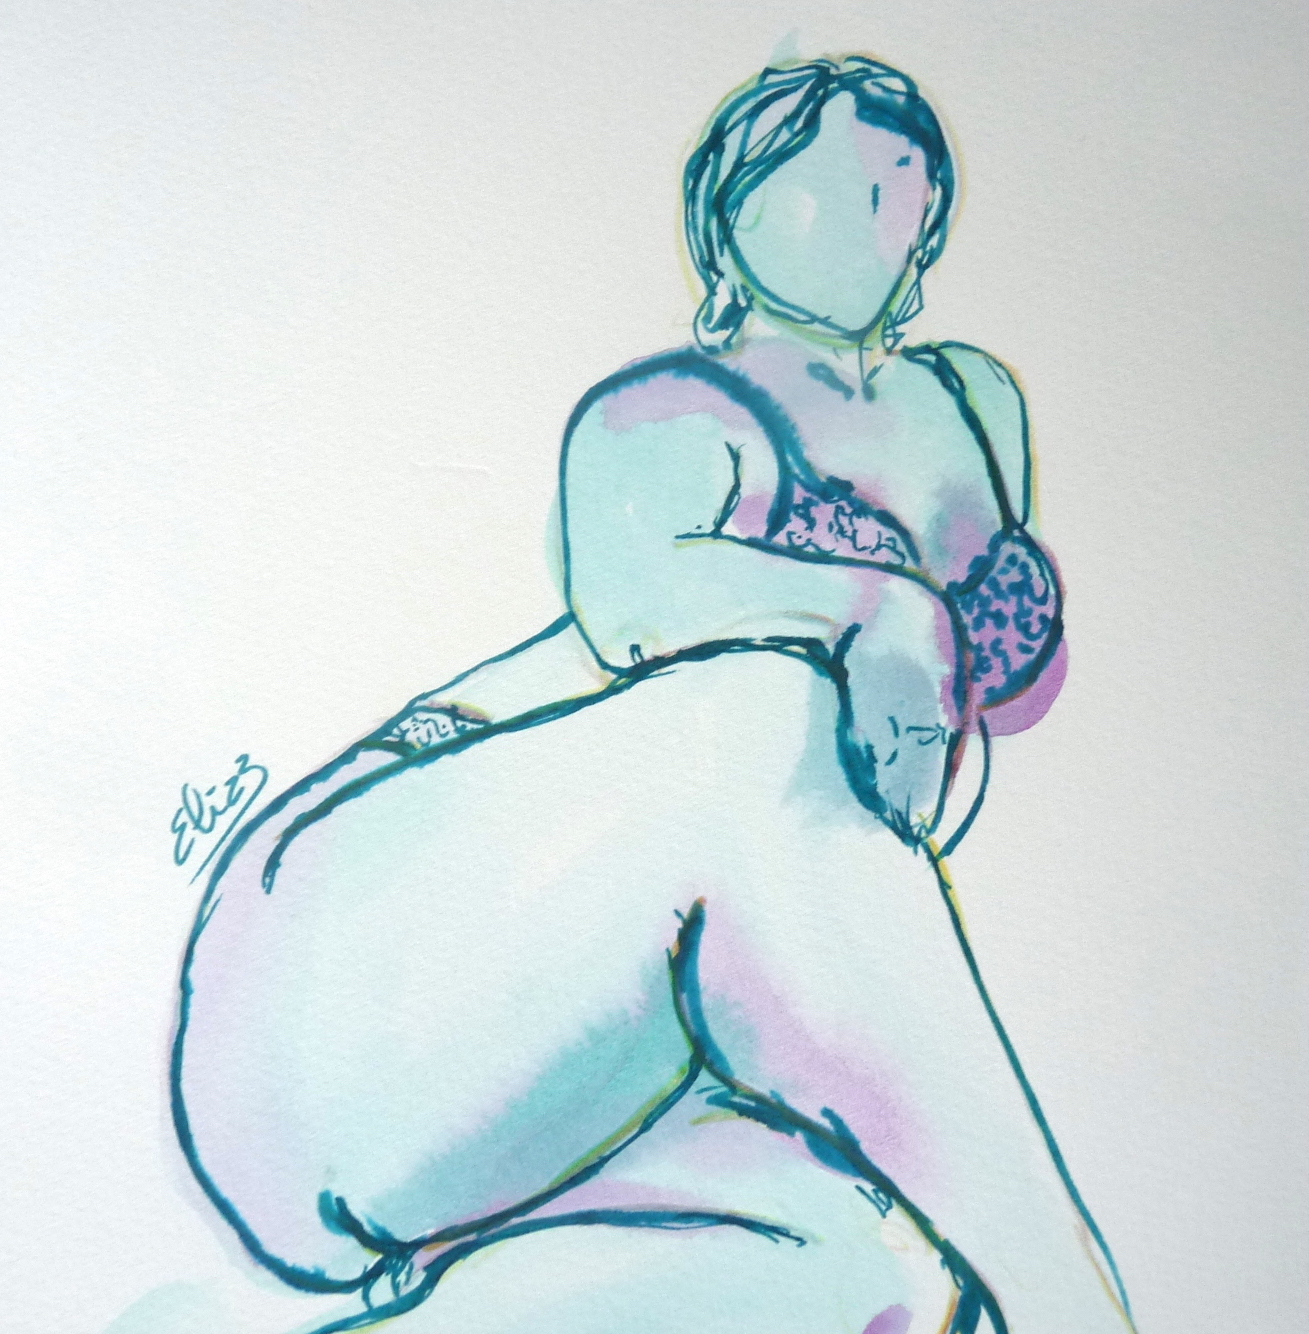 femme ronde croquis elize pigmentropie bodypositive grossophobie feminisme